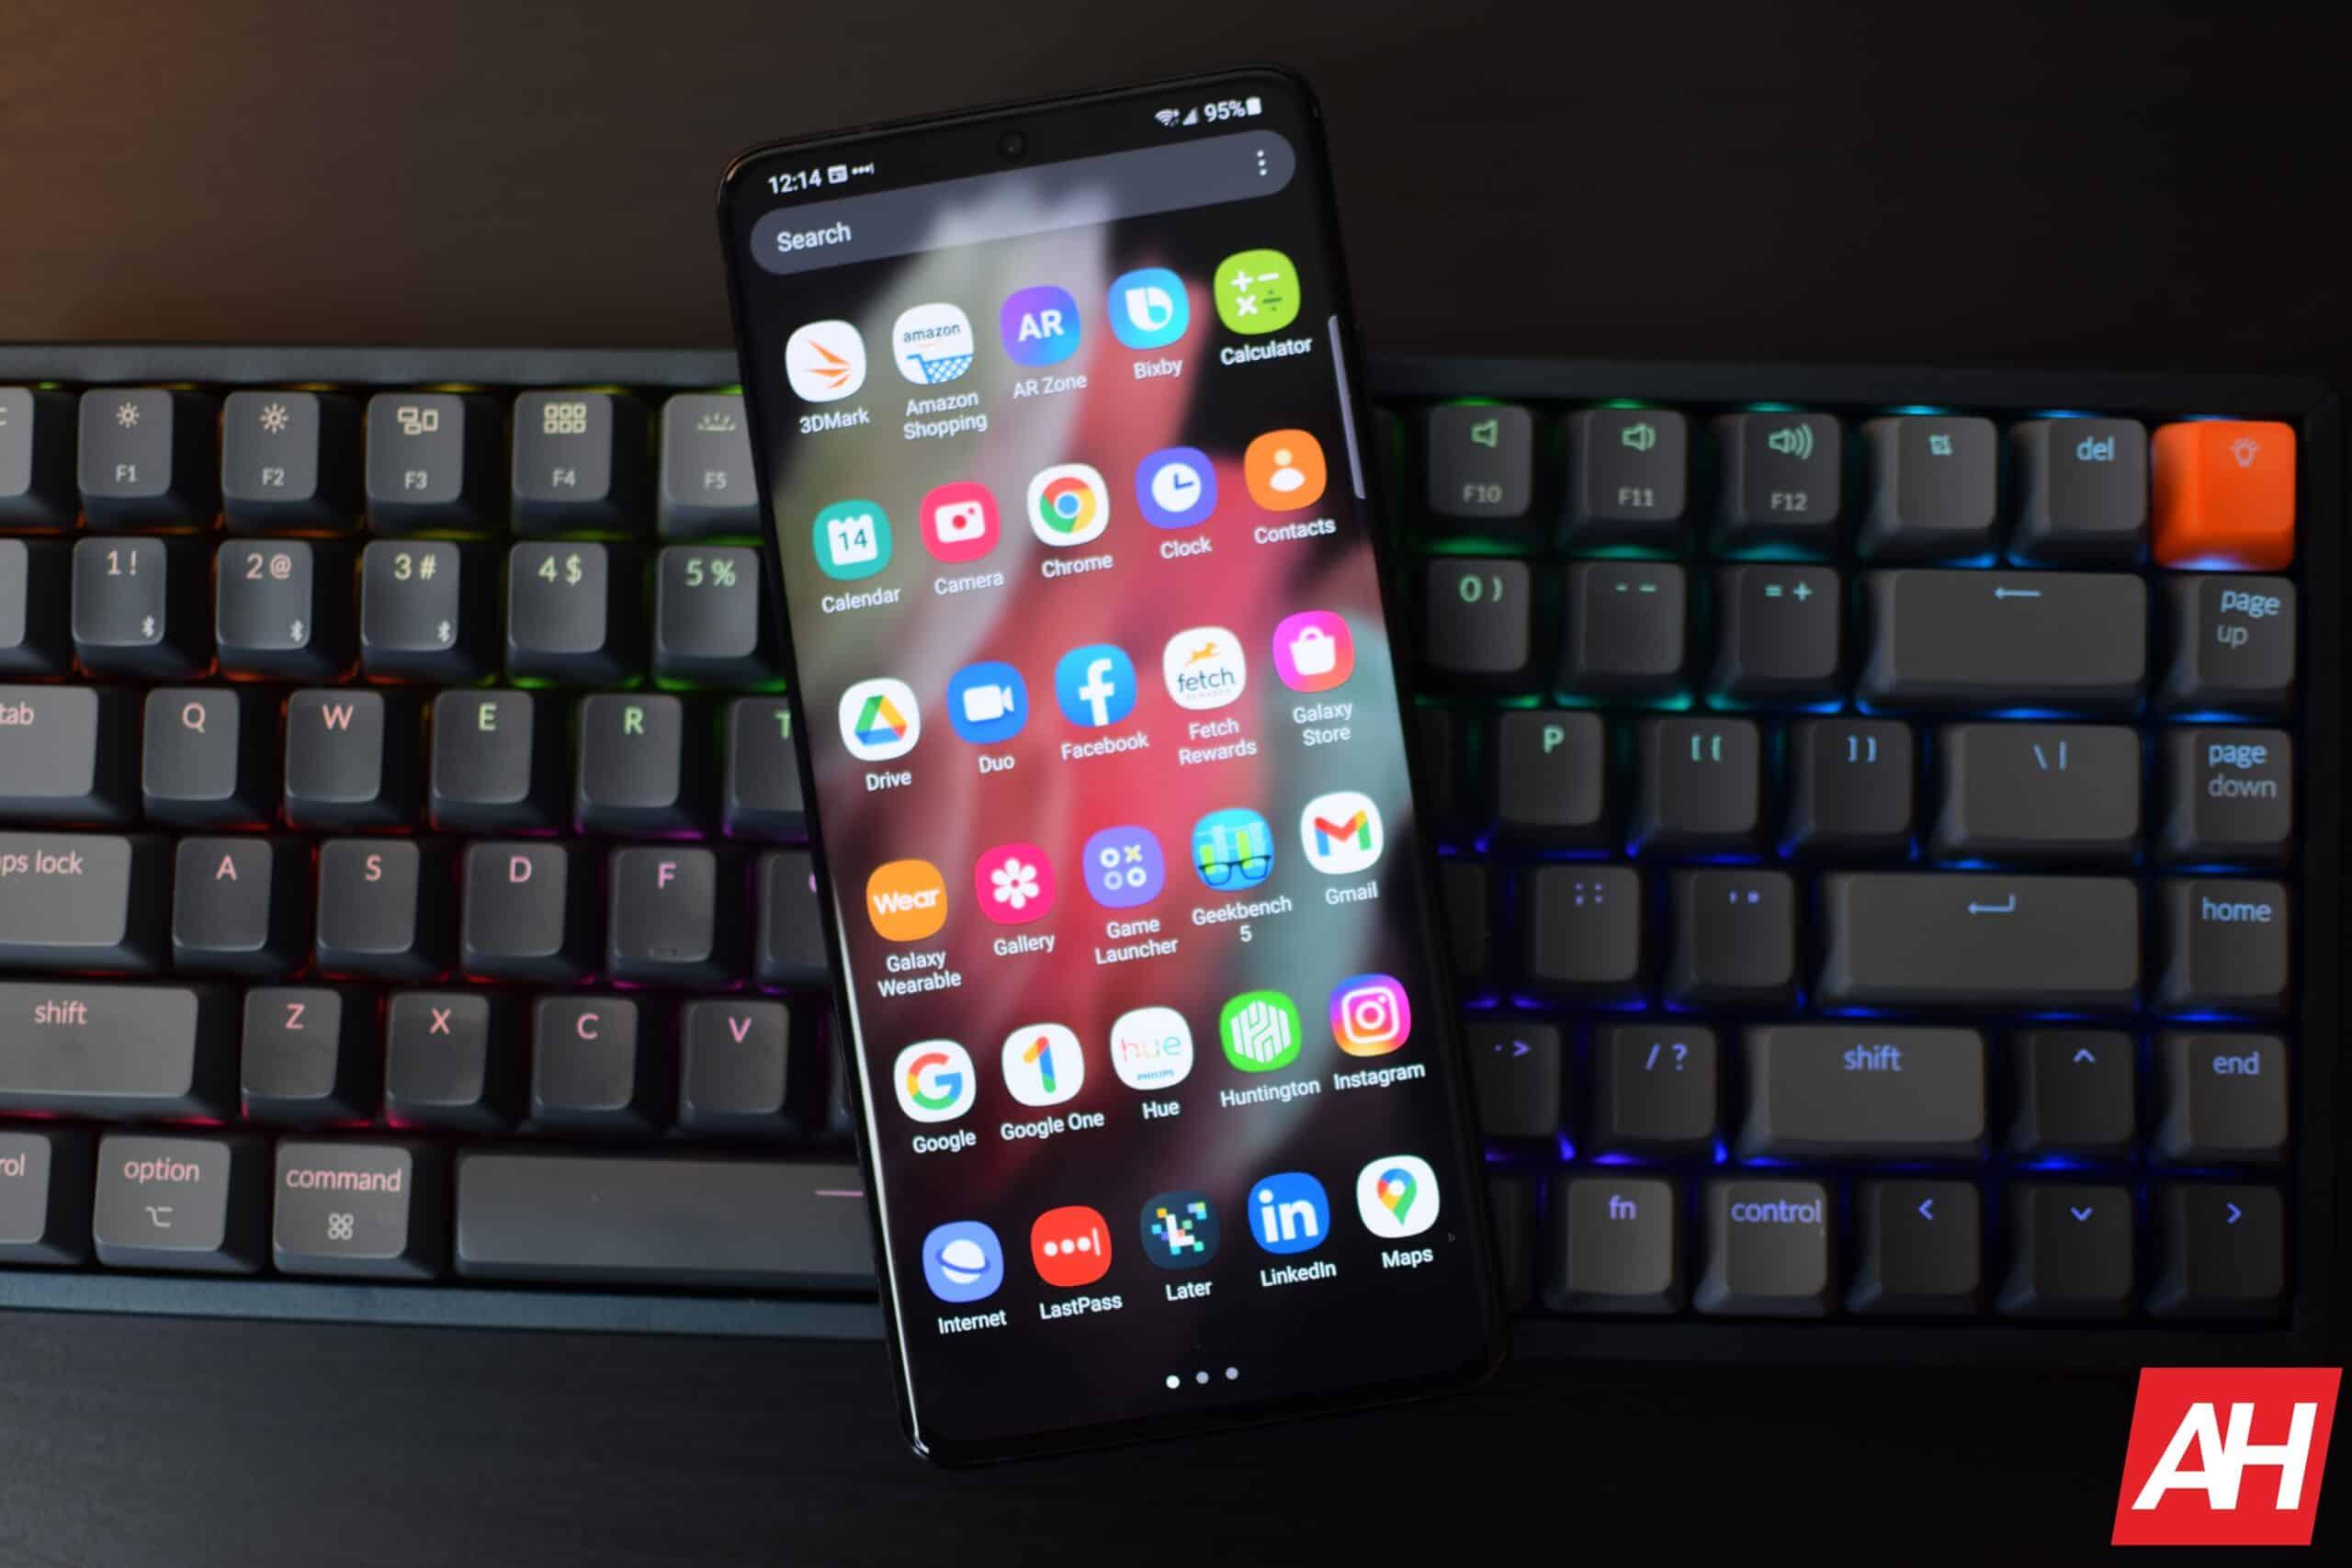 Samsung Galaxy S21 Ultra Hands On AH 1